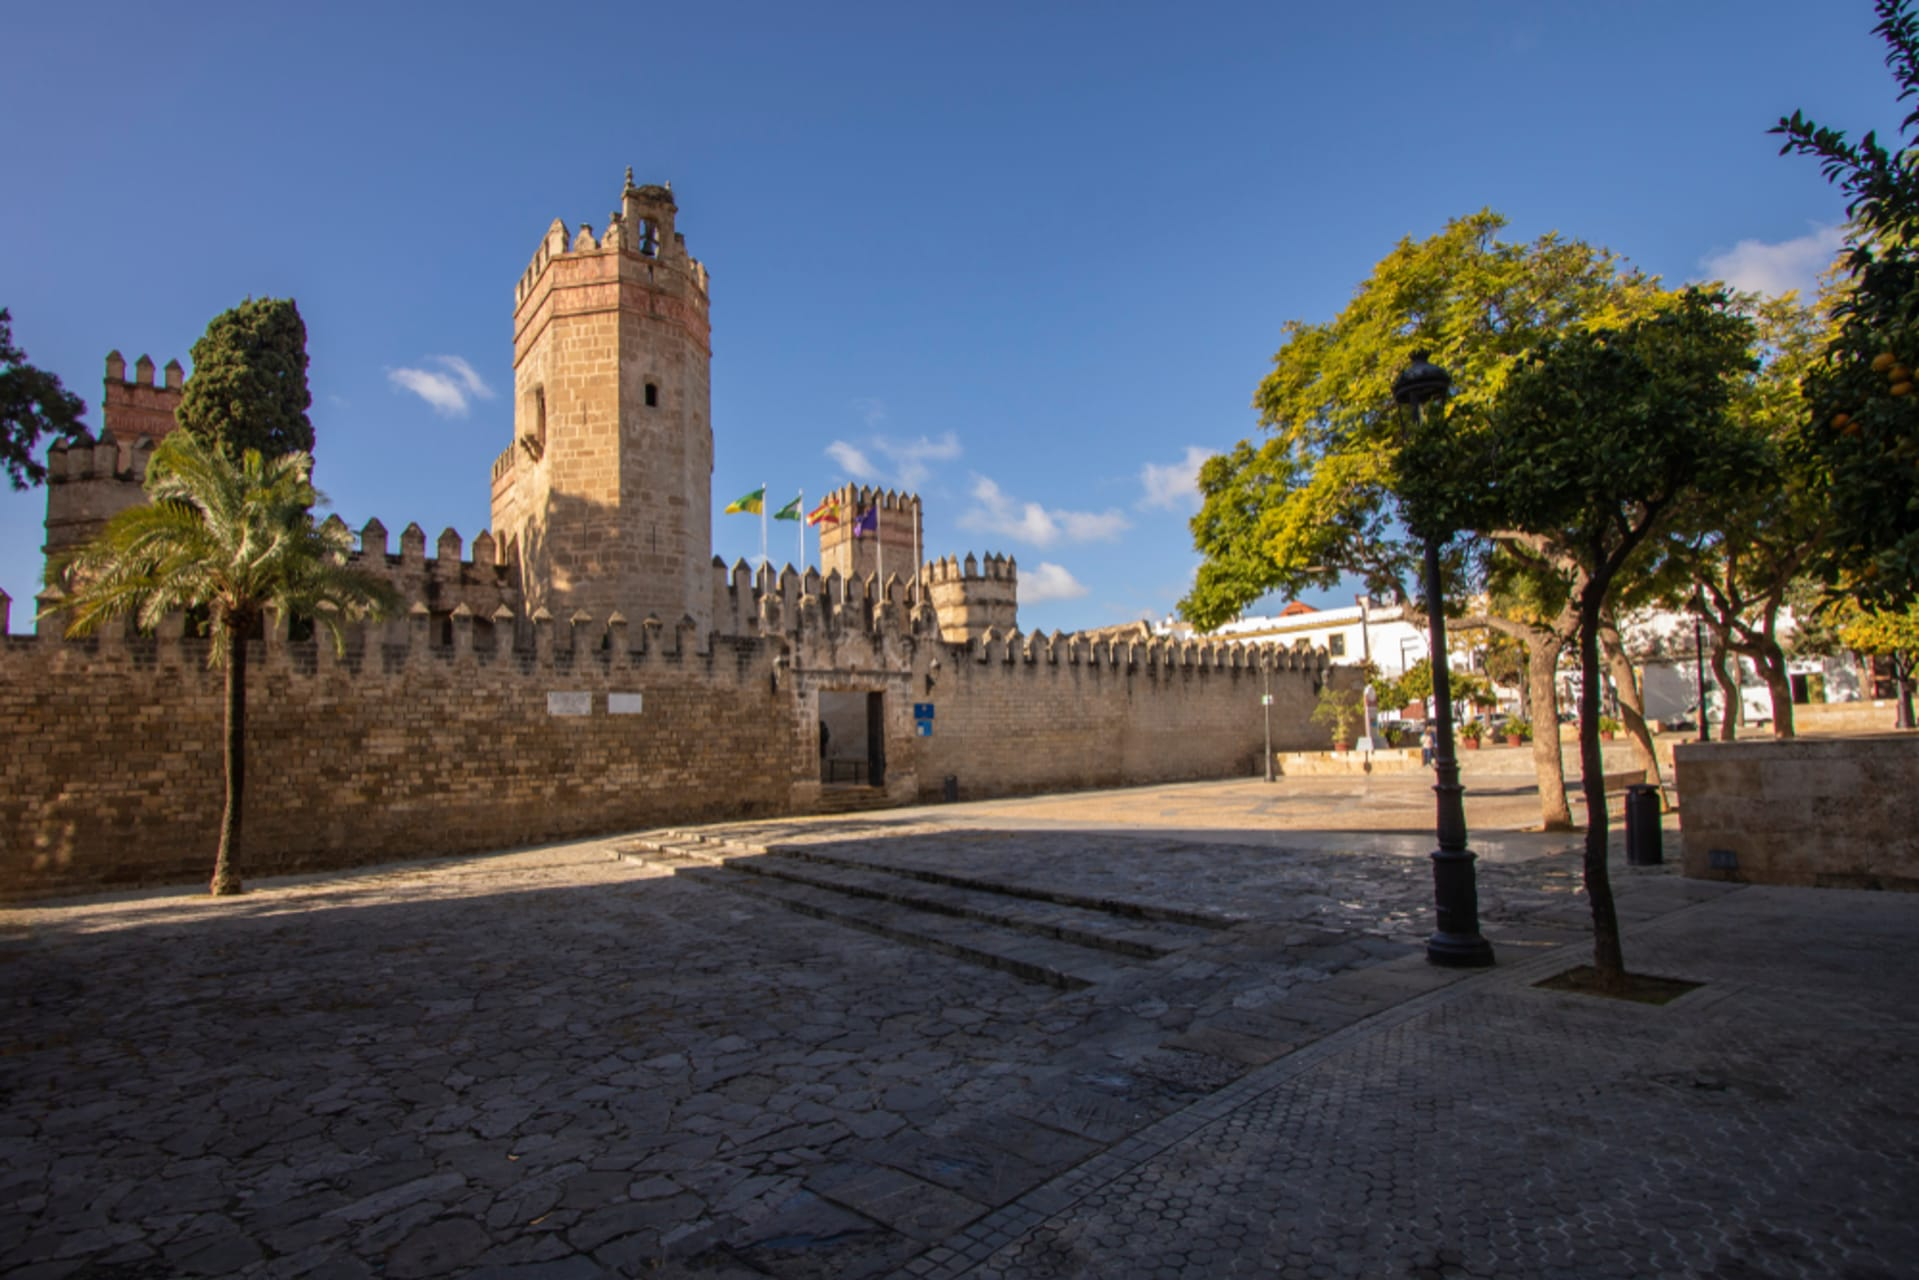 Cádiz - El Puerto de Santa Maria, the city of 100 Palaces and the New World